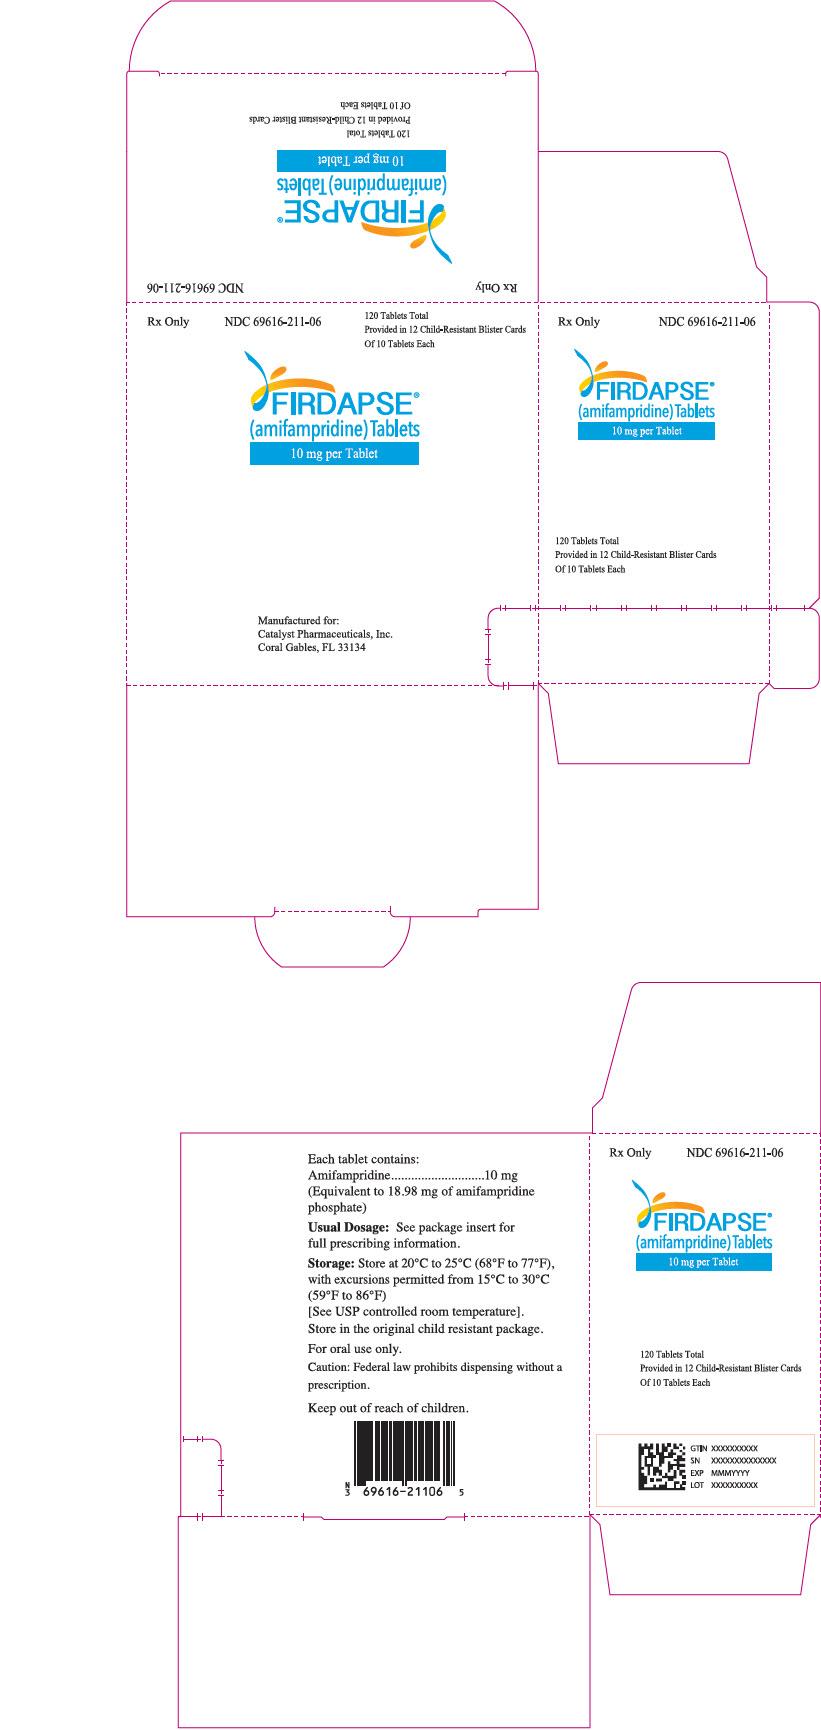 PRINCIPAL DISPLAY PANEL - 10 mg Tablet Blister Pack Carton